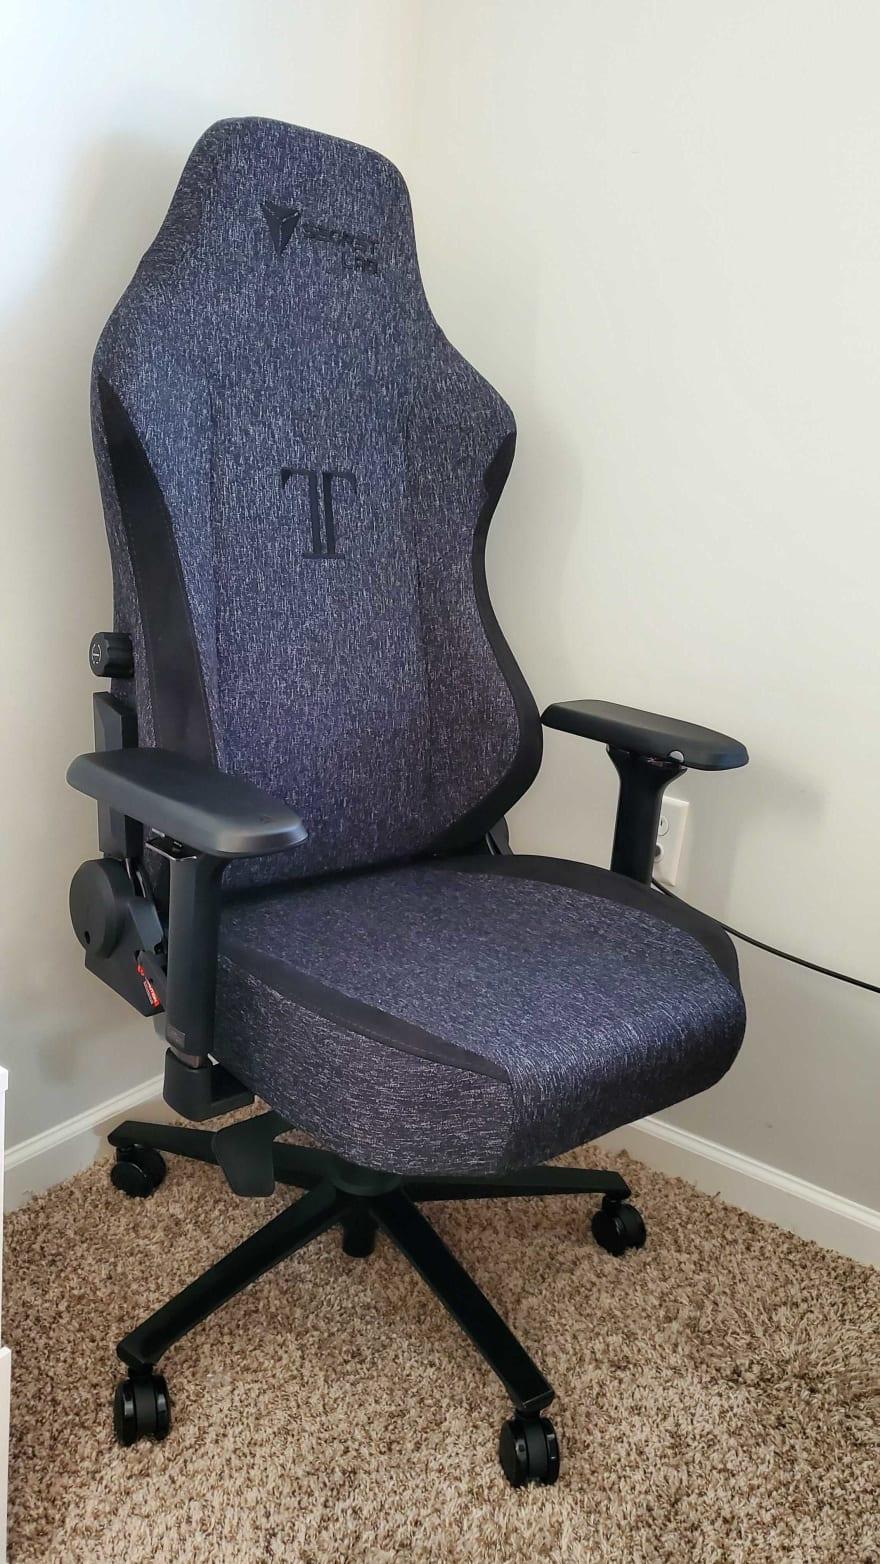 SecretLab TITAN chair in room corner